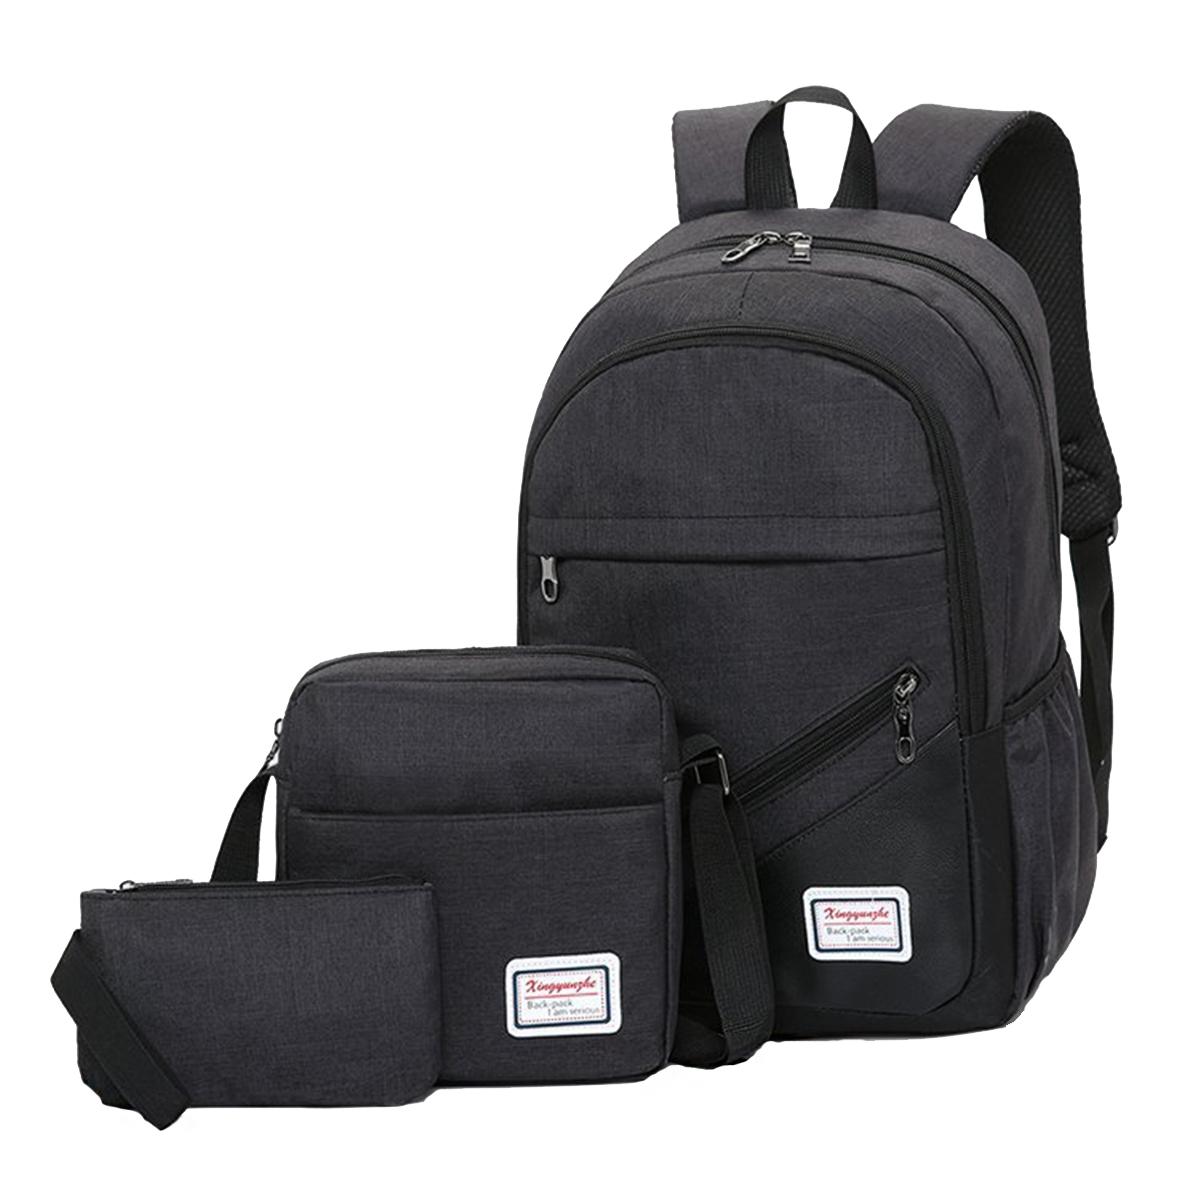 3 Pcs Backpack School Bag Laptop Bag Canvas Cross body Bags Camping Travel Handbag Pen Bag